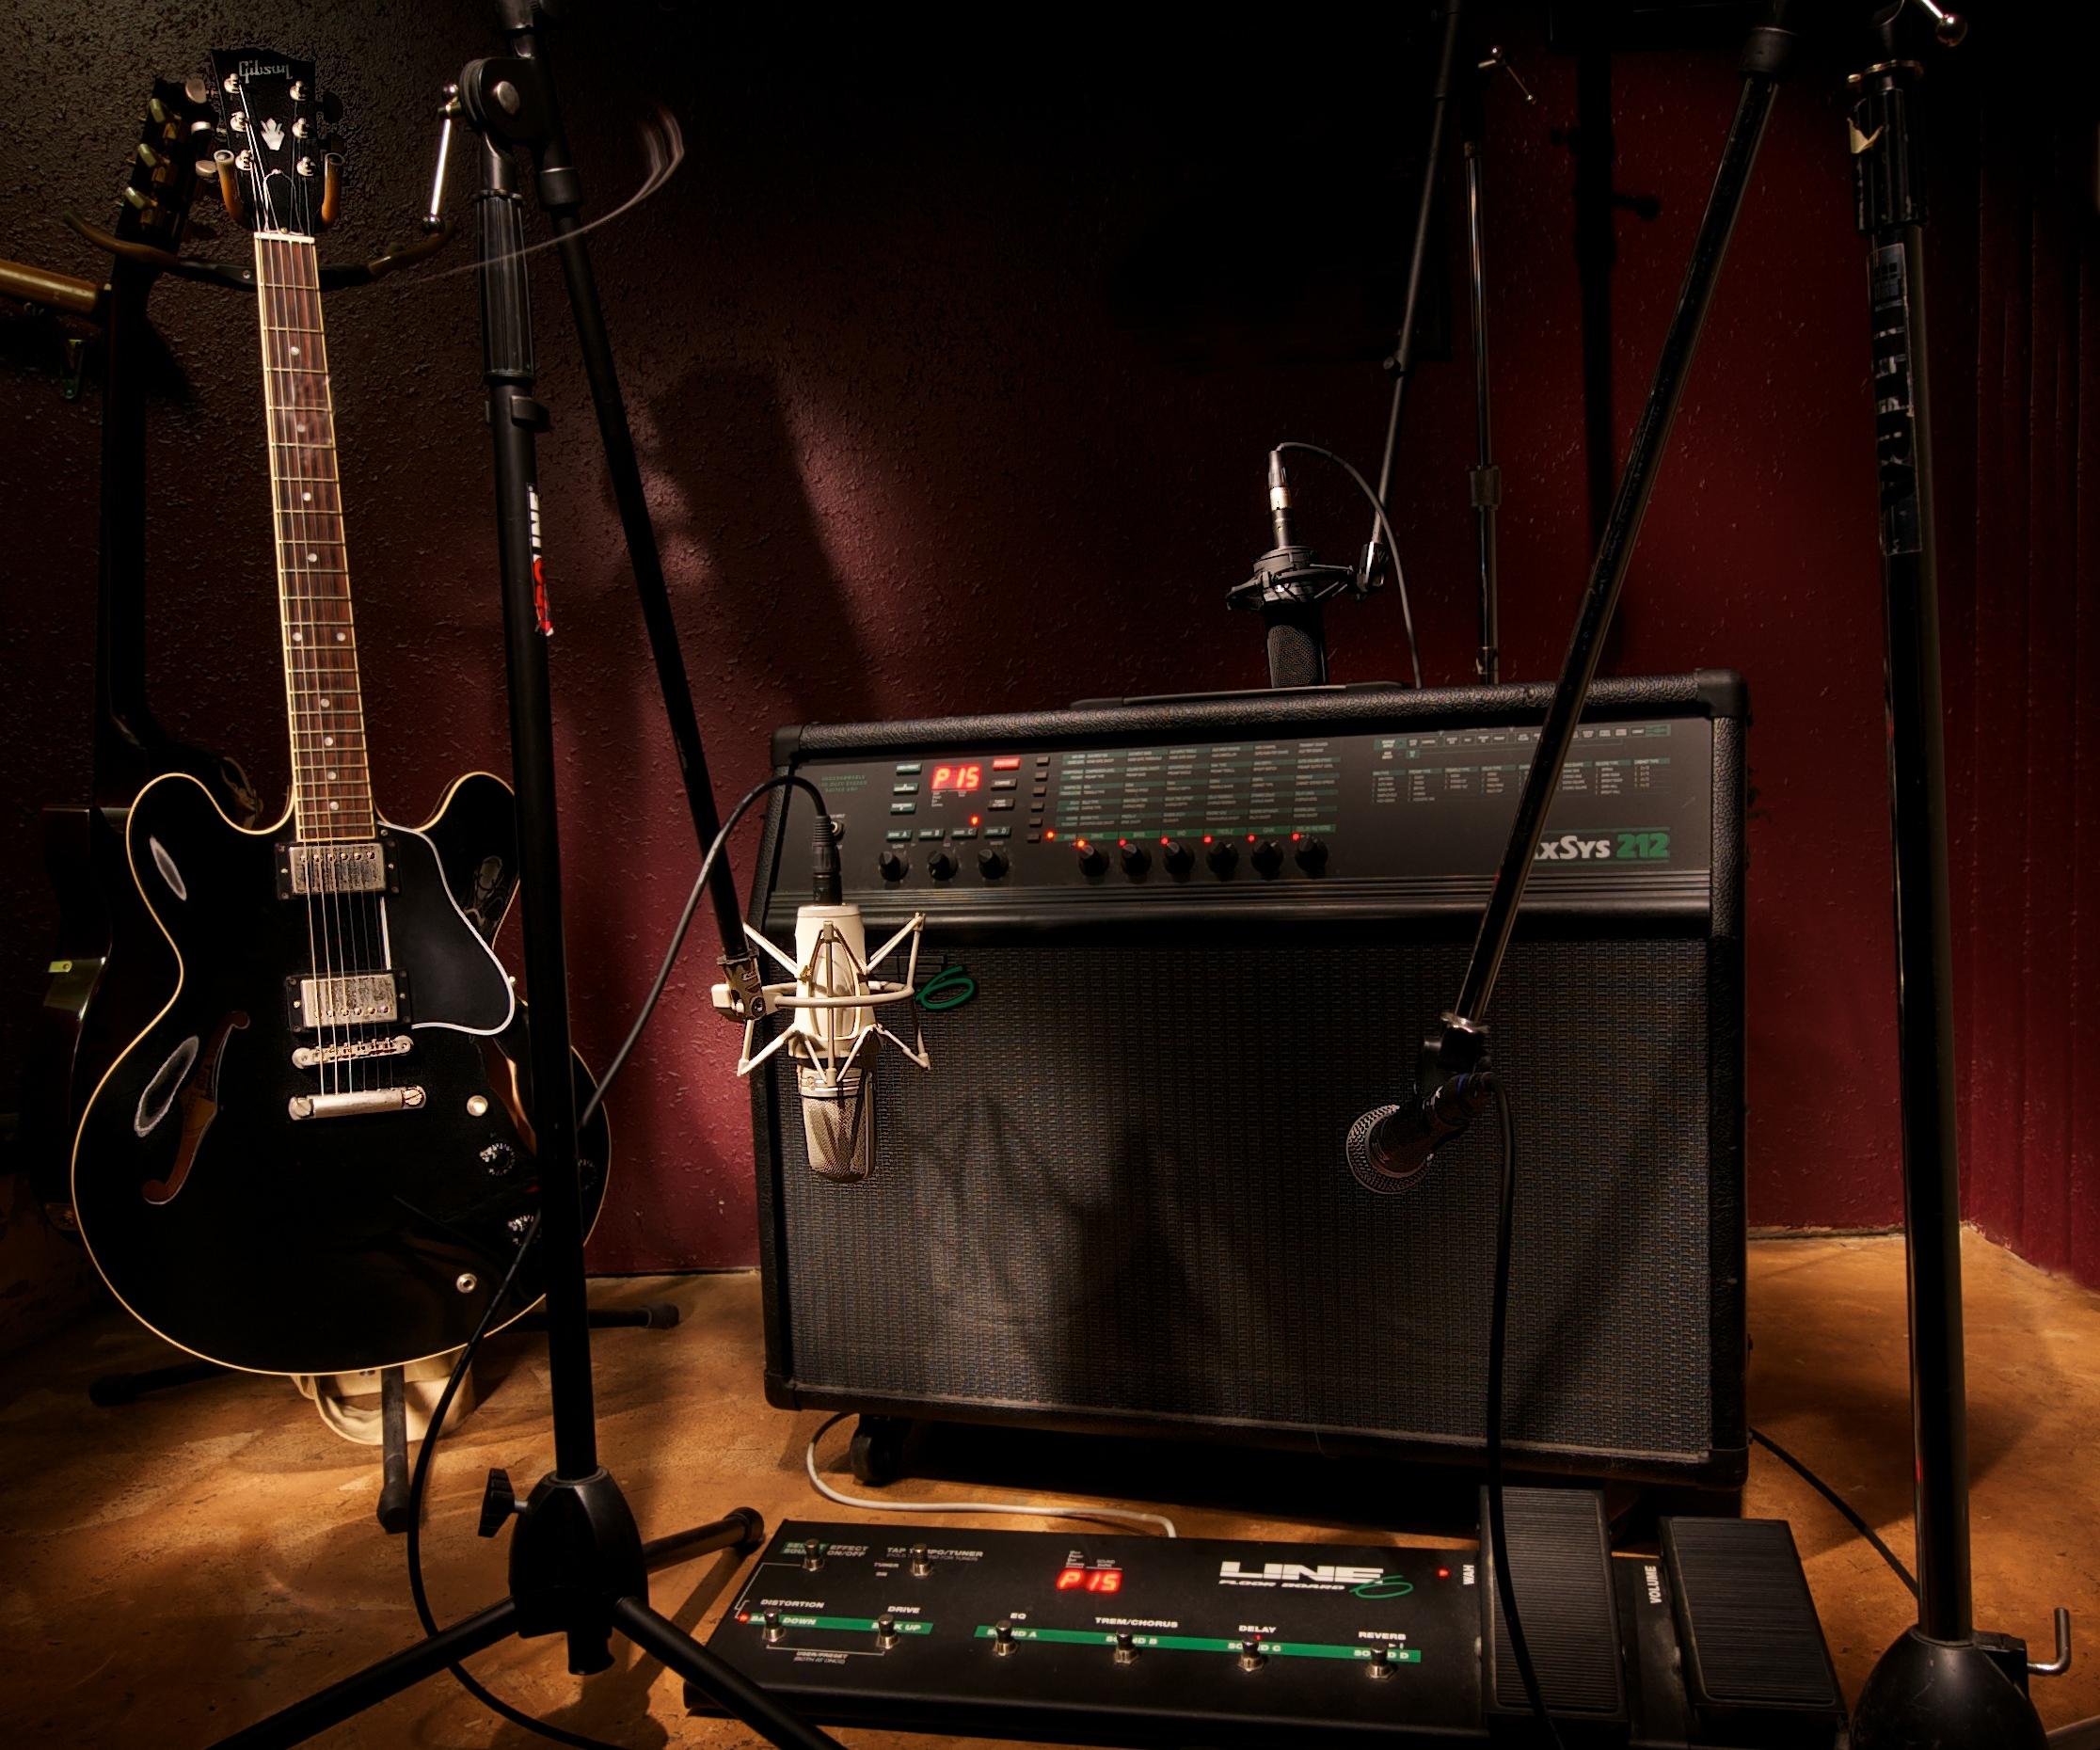 We get some amazing guitar tones!